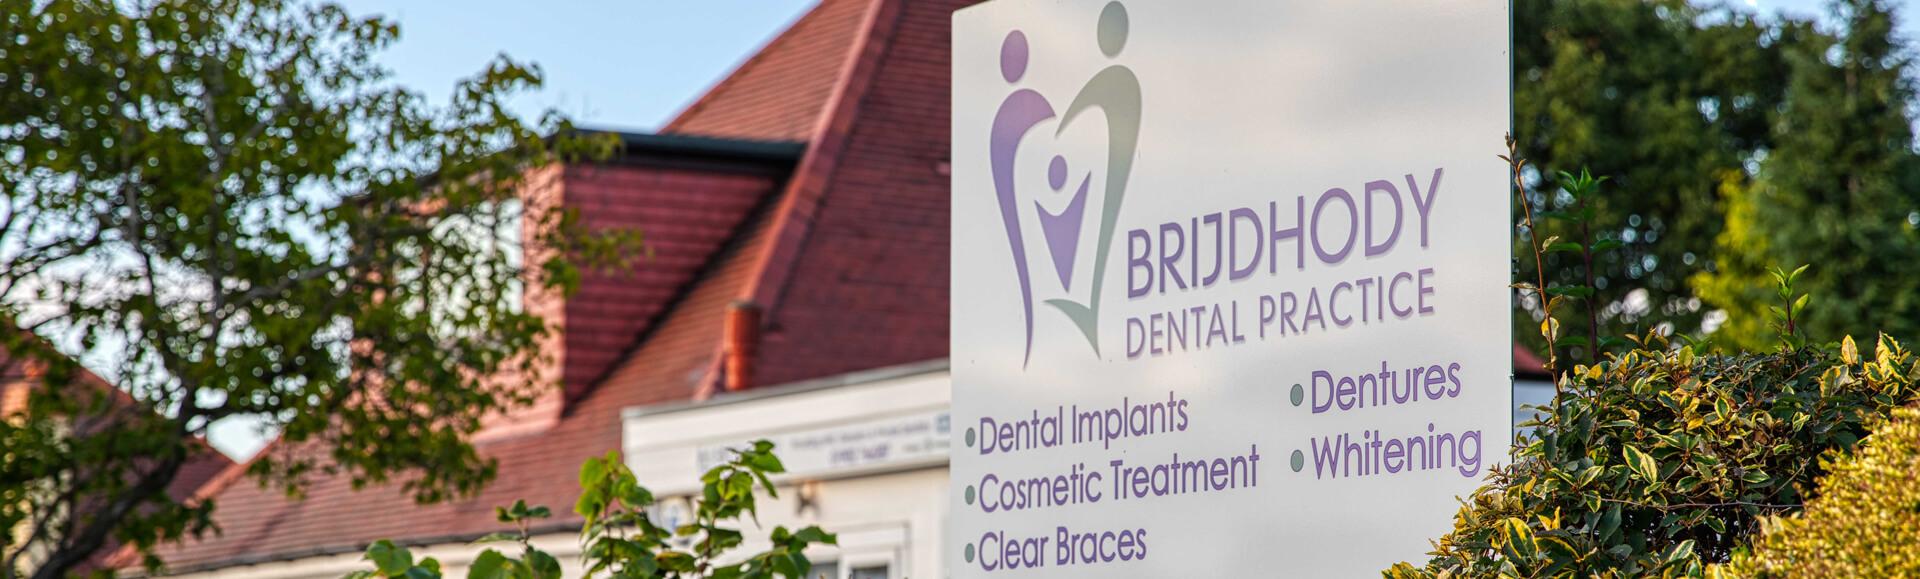 Why Choose Brij Dhody Dental Practice